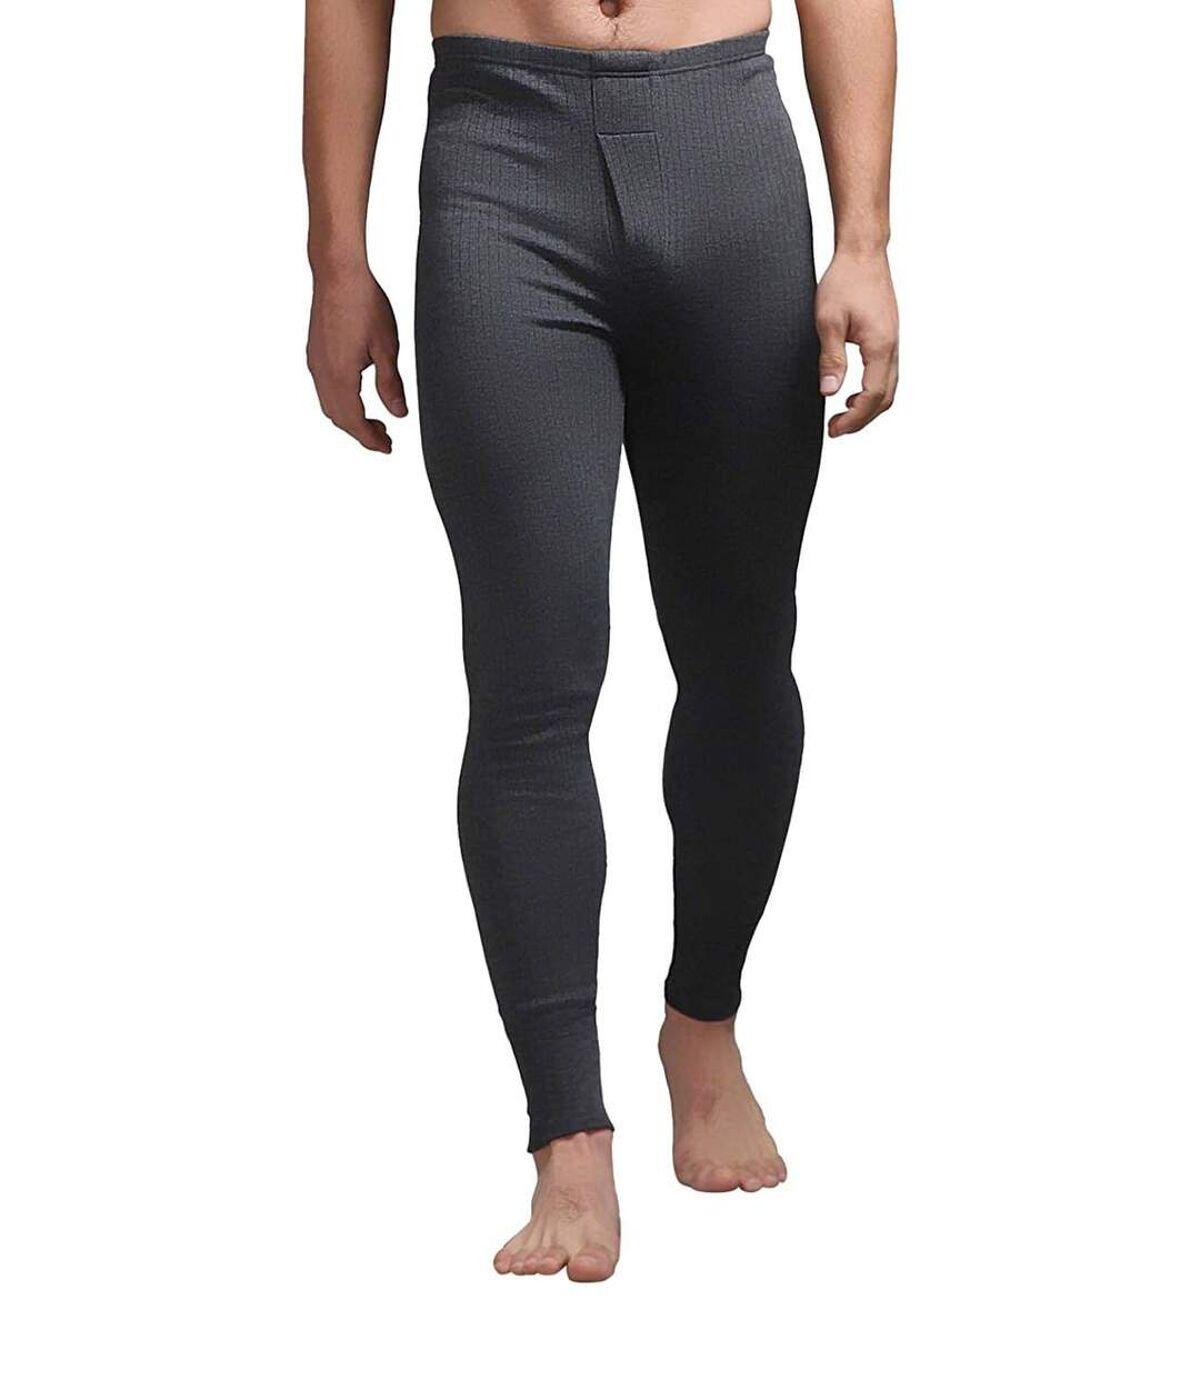 Mens Cotton Thermal Underwear Long Johns Leggings